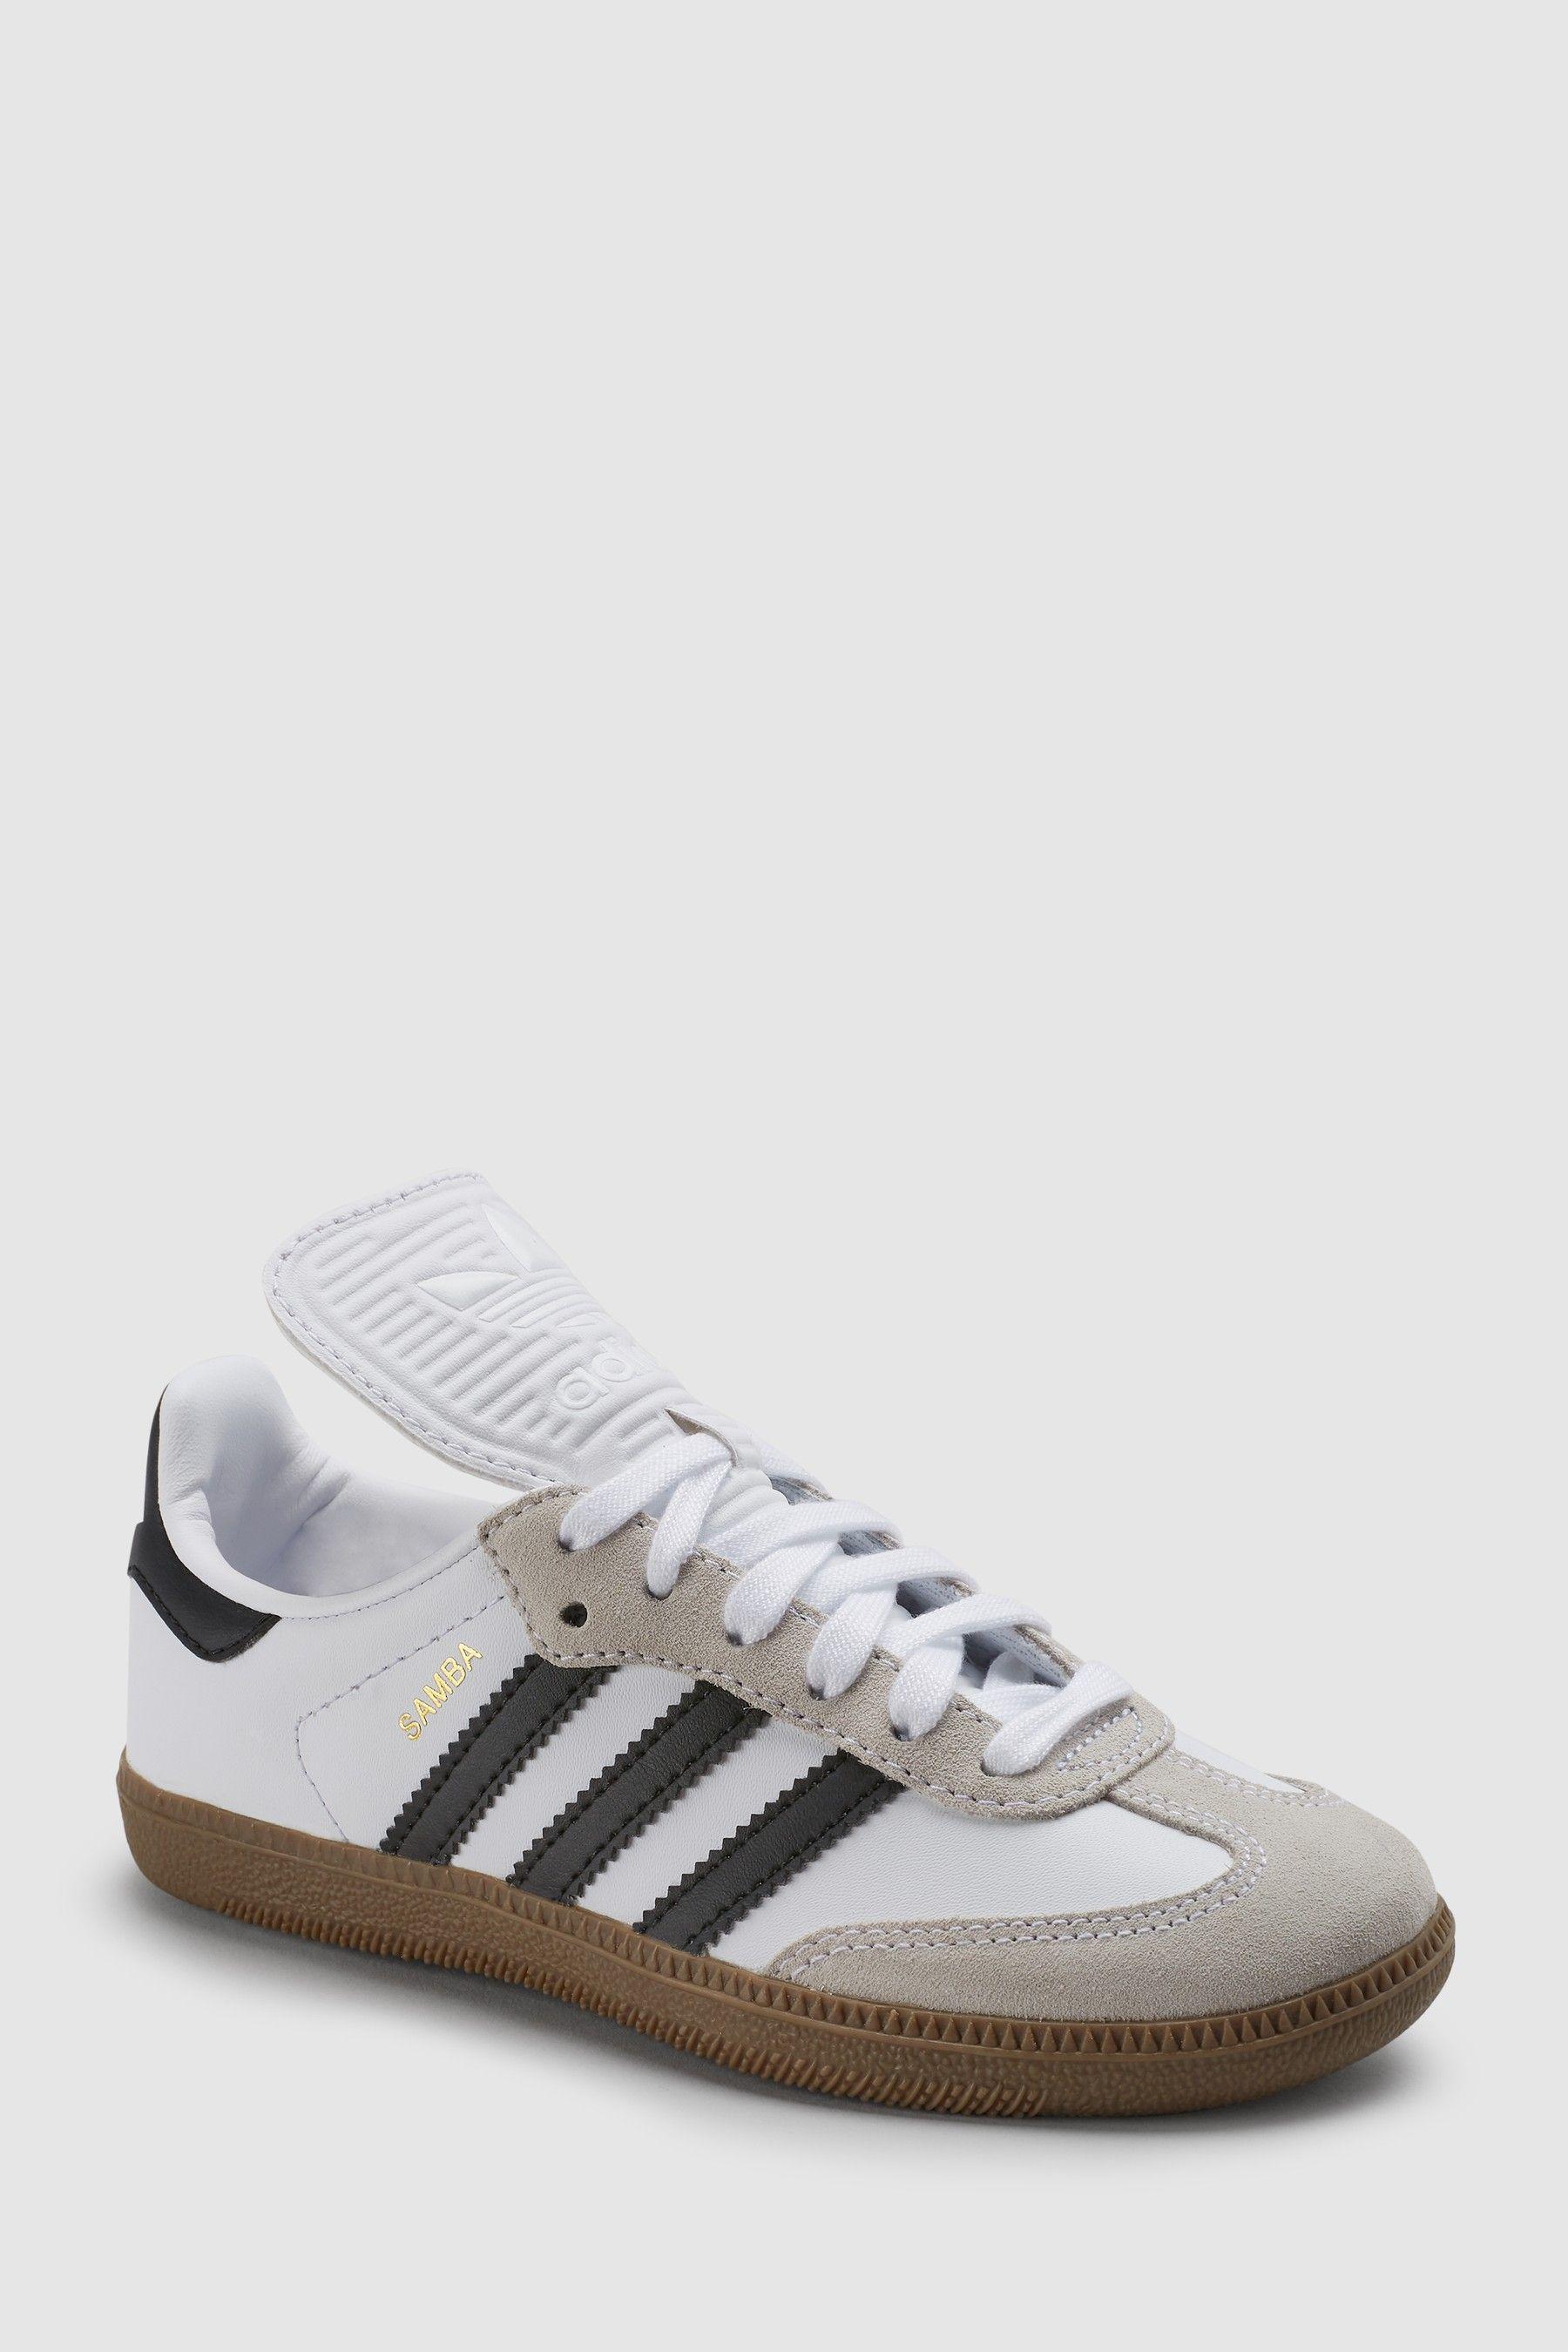 Boys adidas Originals Samba Junior Trainers White   Adidas